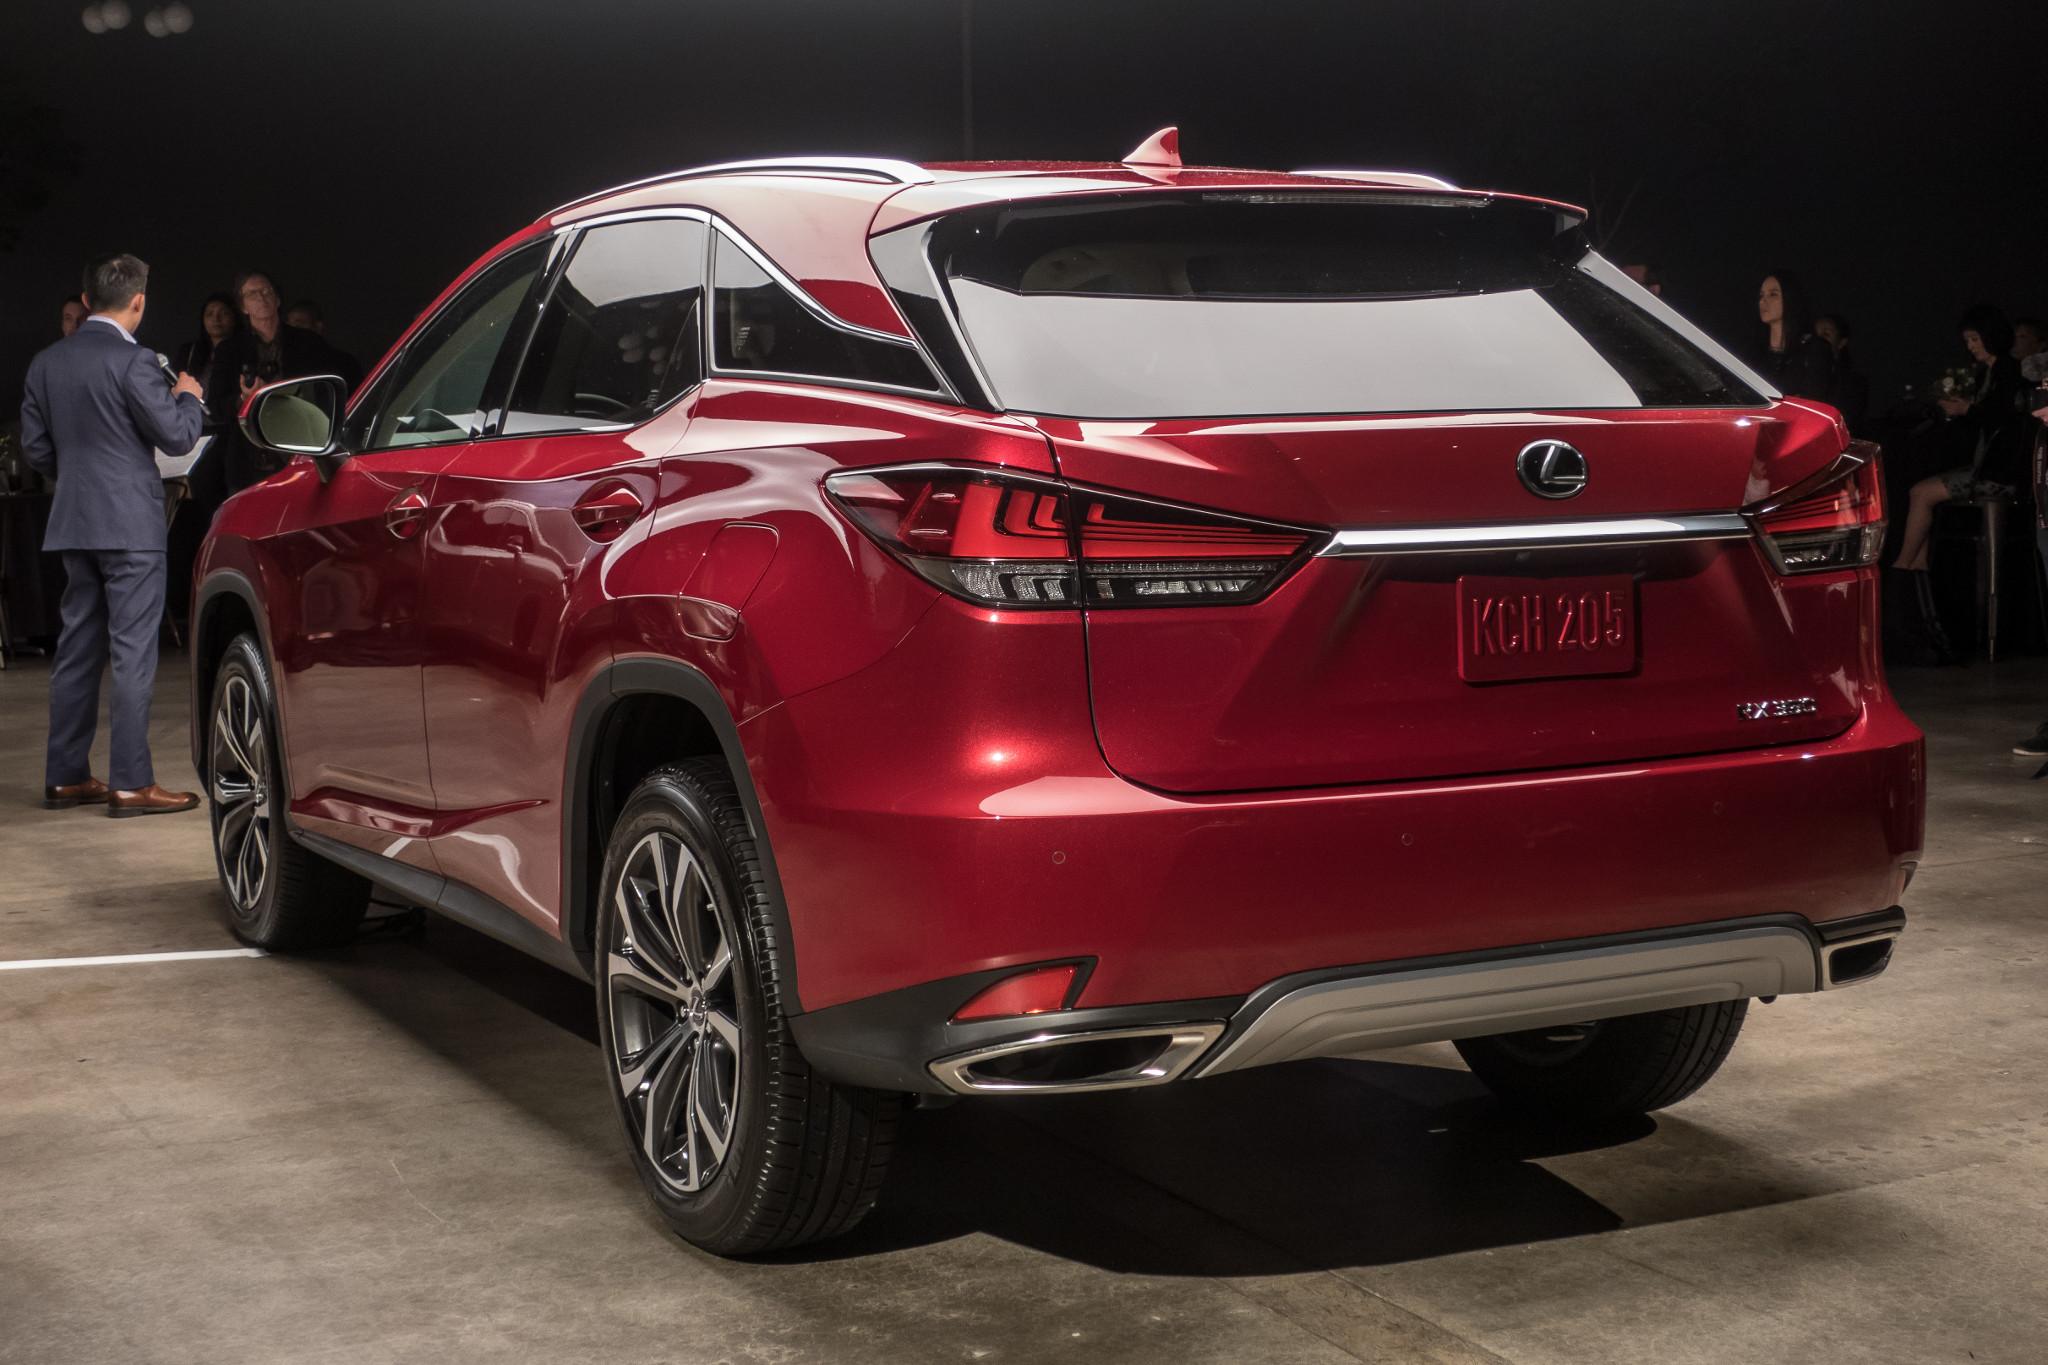 2021 lexus rx 350 release date  car wallpaper